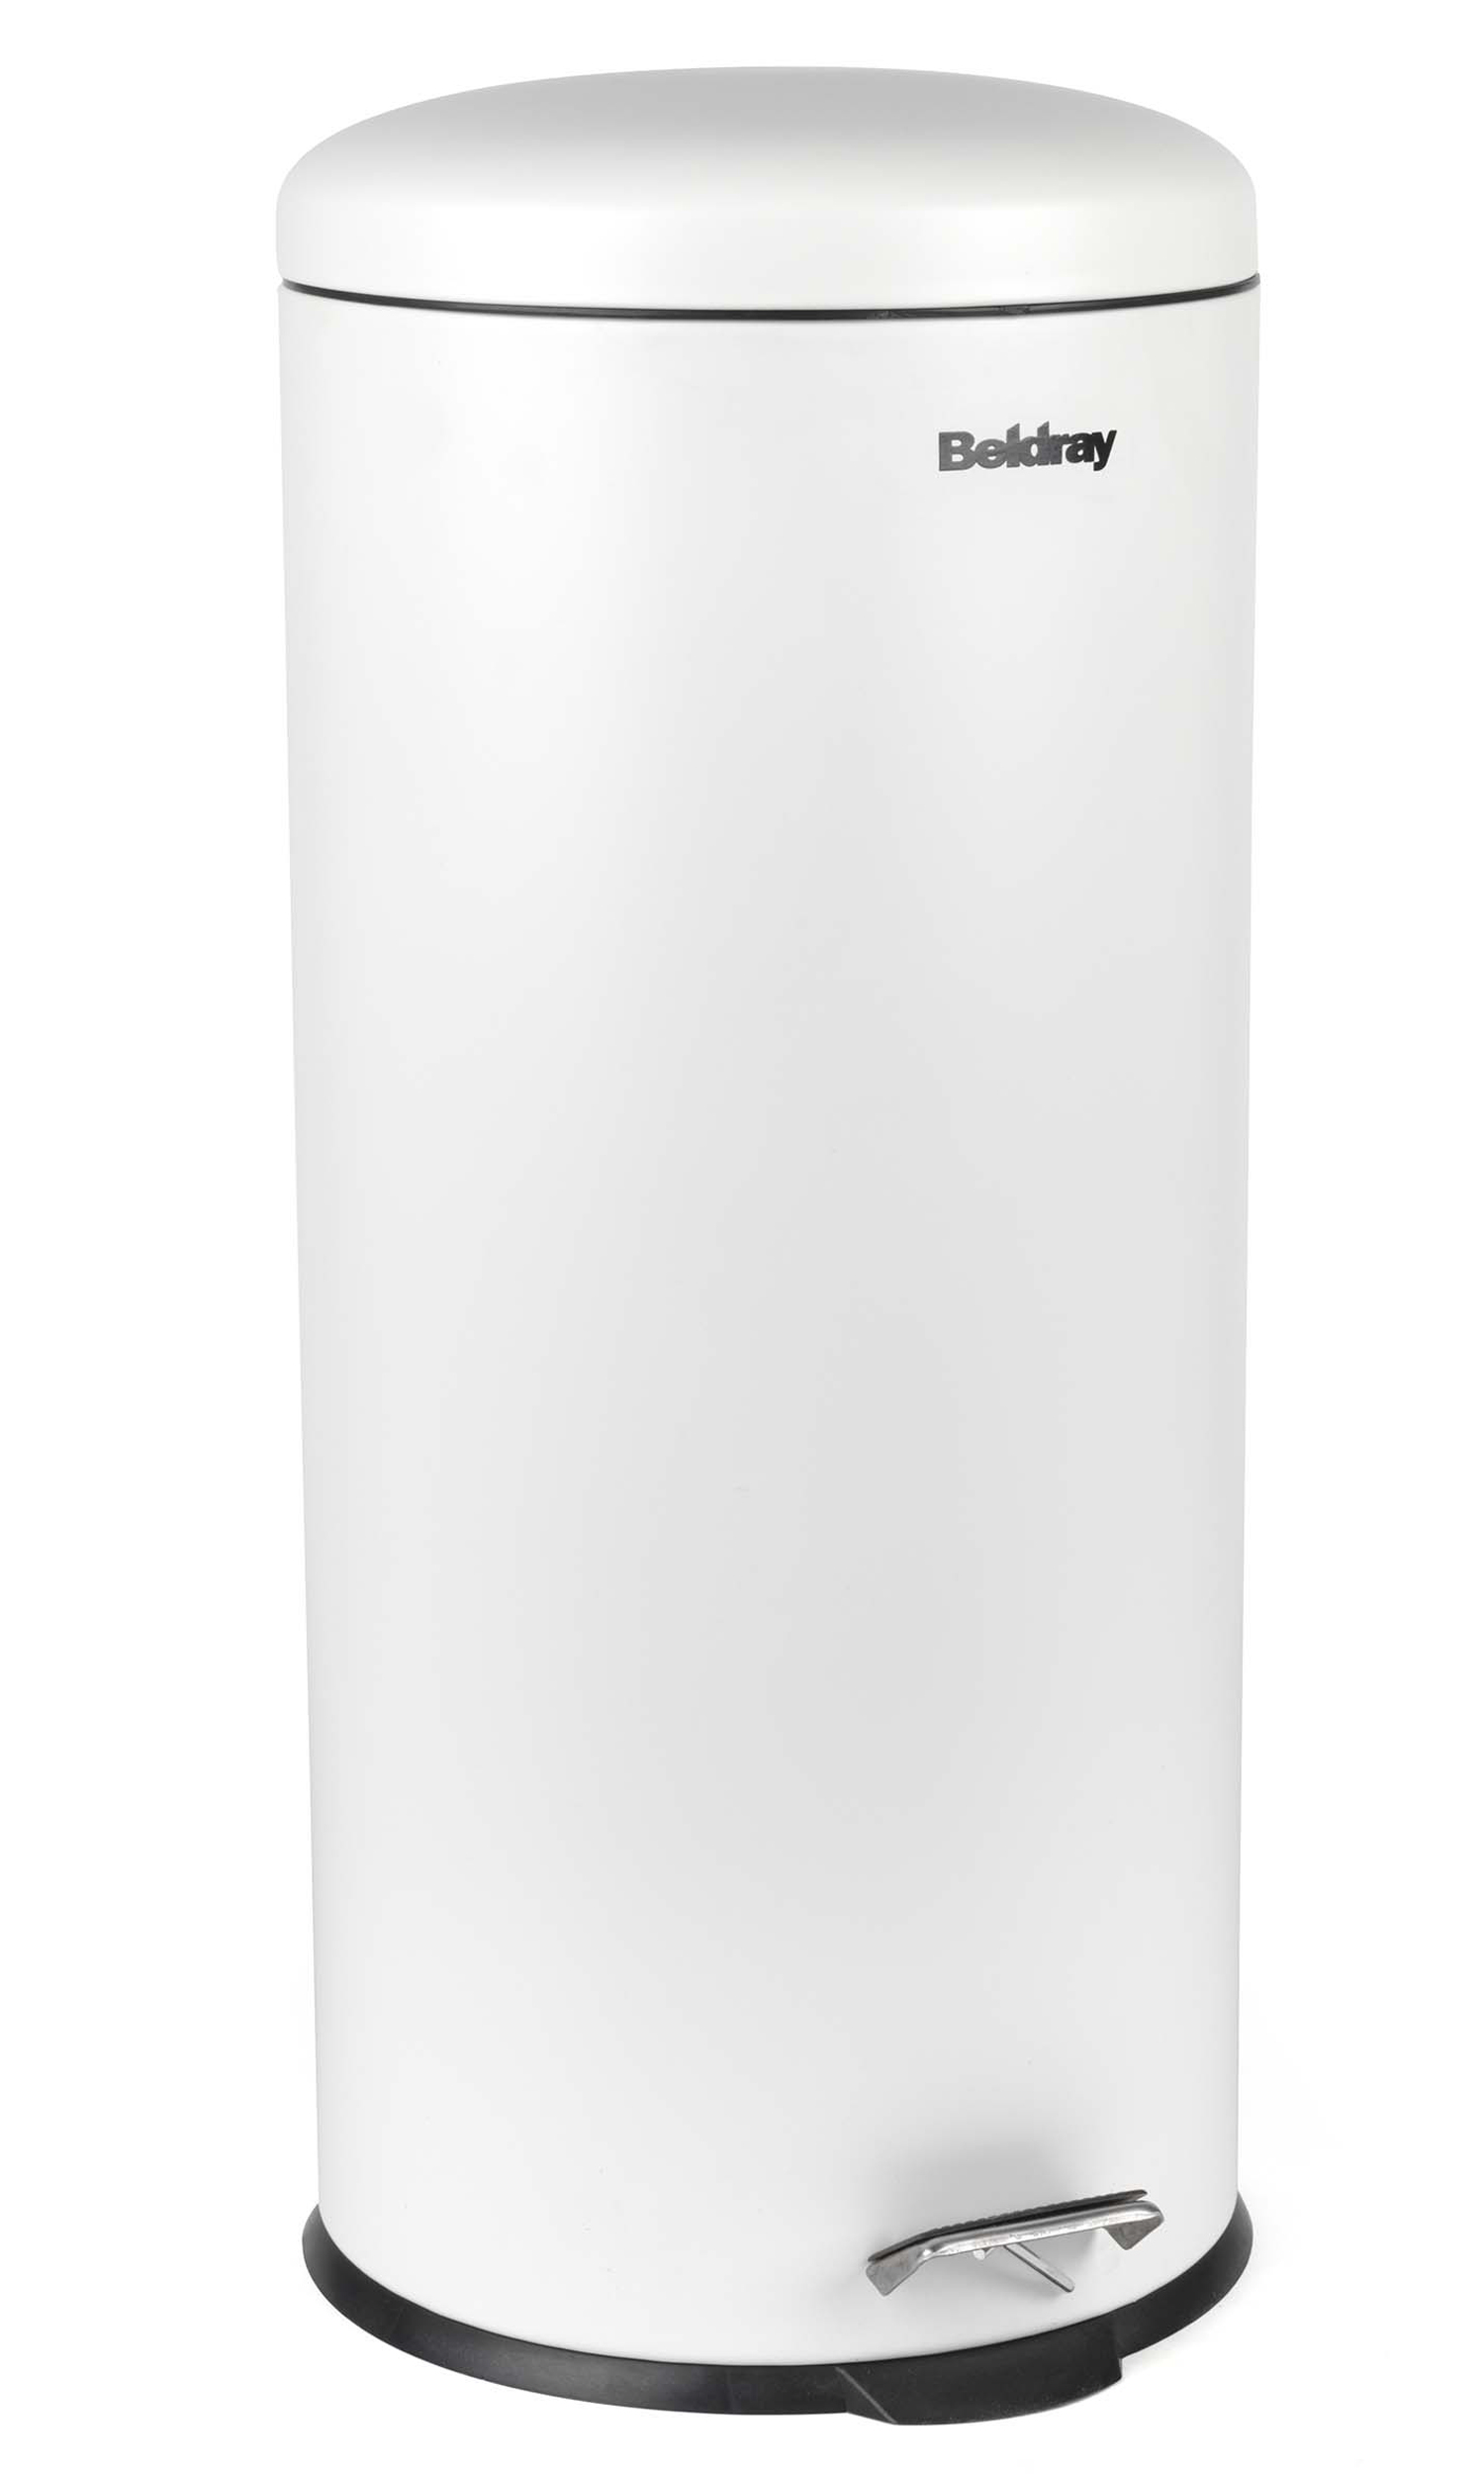 Beldray LA038074WHT 30 Litre White Kitchen Bin With Soft Closing Lid